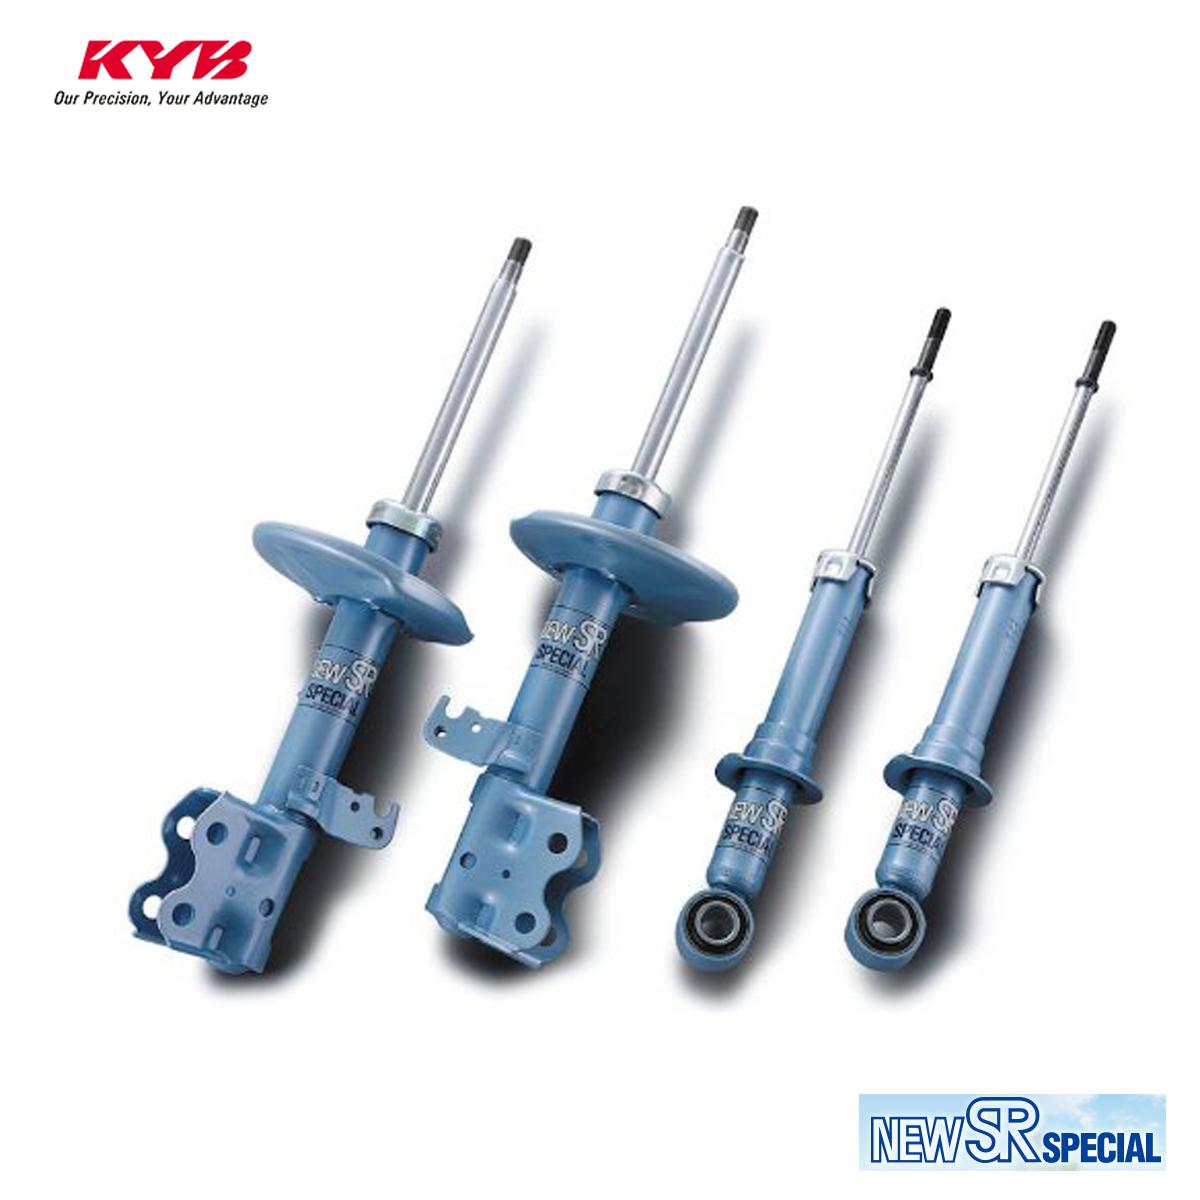 KYB カヤバ N WGN JH1 ショックアブソーバー 1台分 NEW SR SPECIAL NS-56851341 配送先条件有り